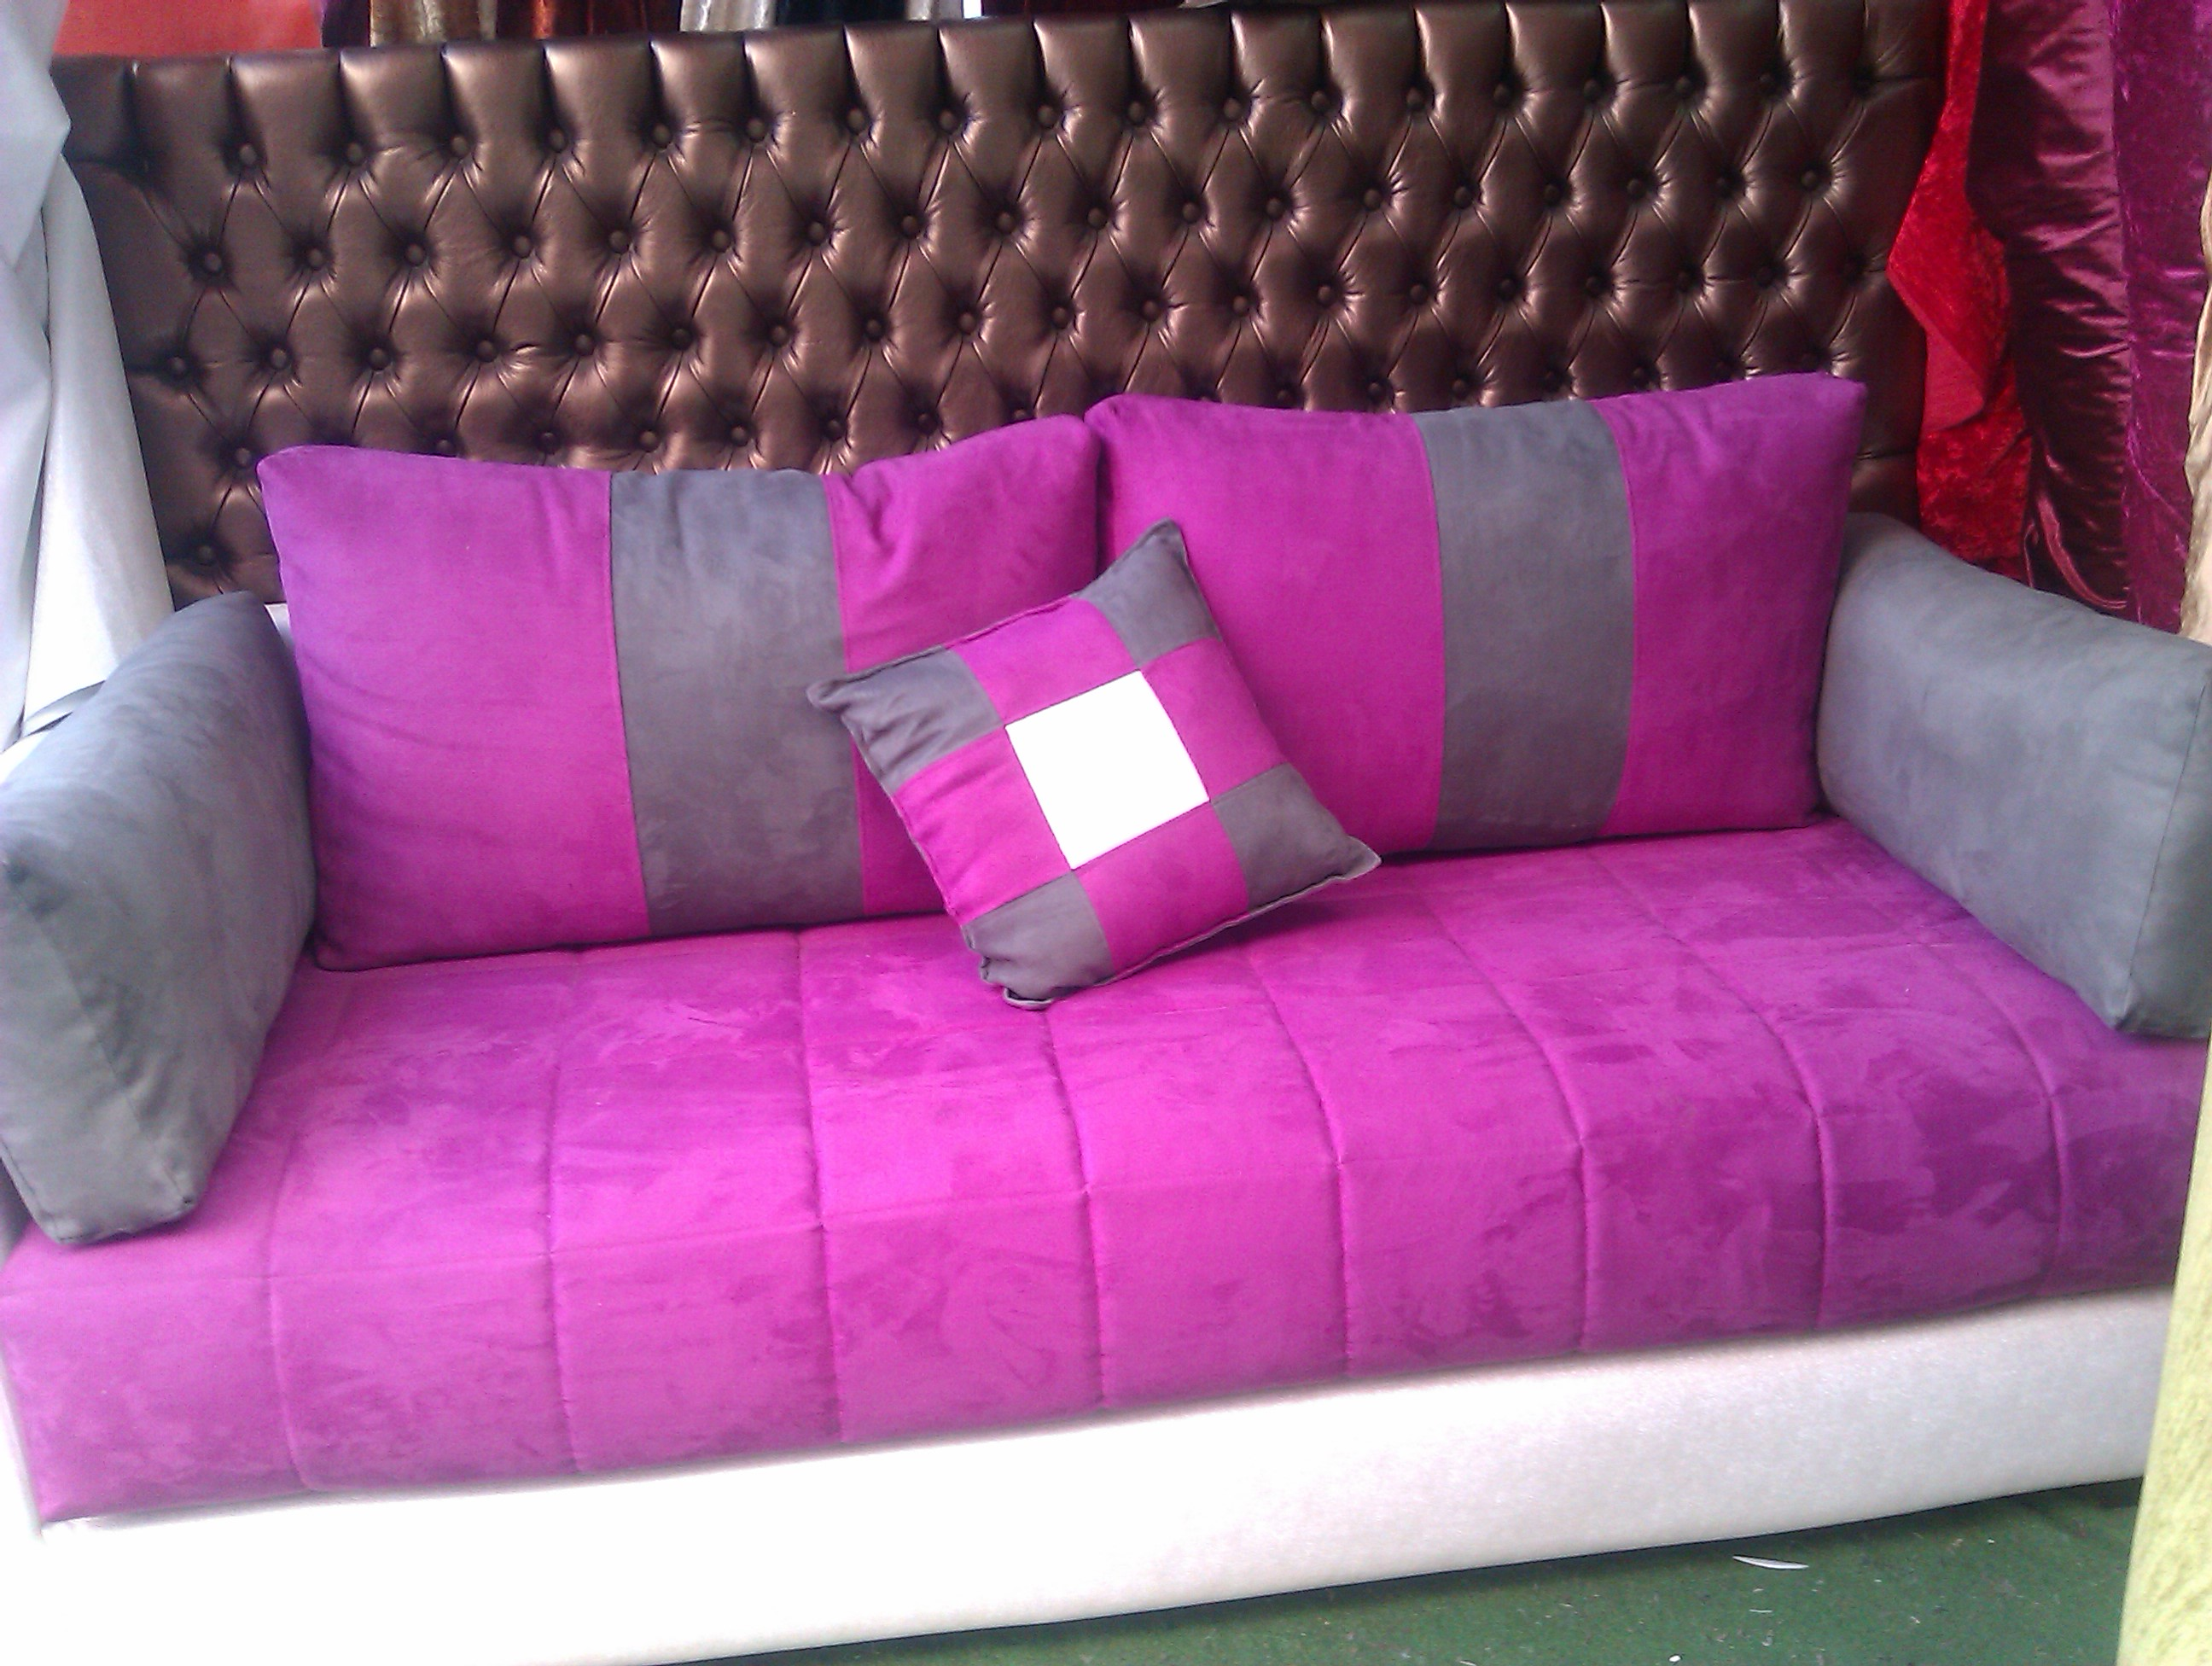 kit tissu salon marocain comprenant1 housse de sedari 2m2. Black Bedroom Furniture Sets. Home Design Ideas